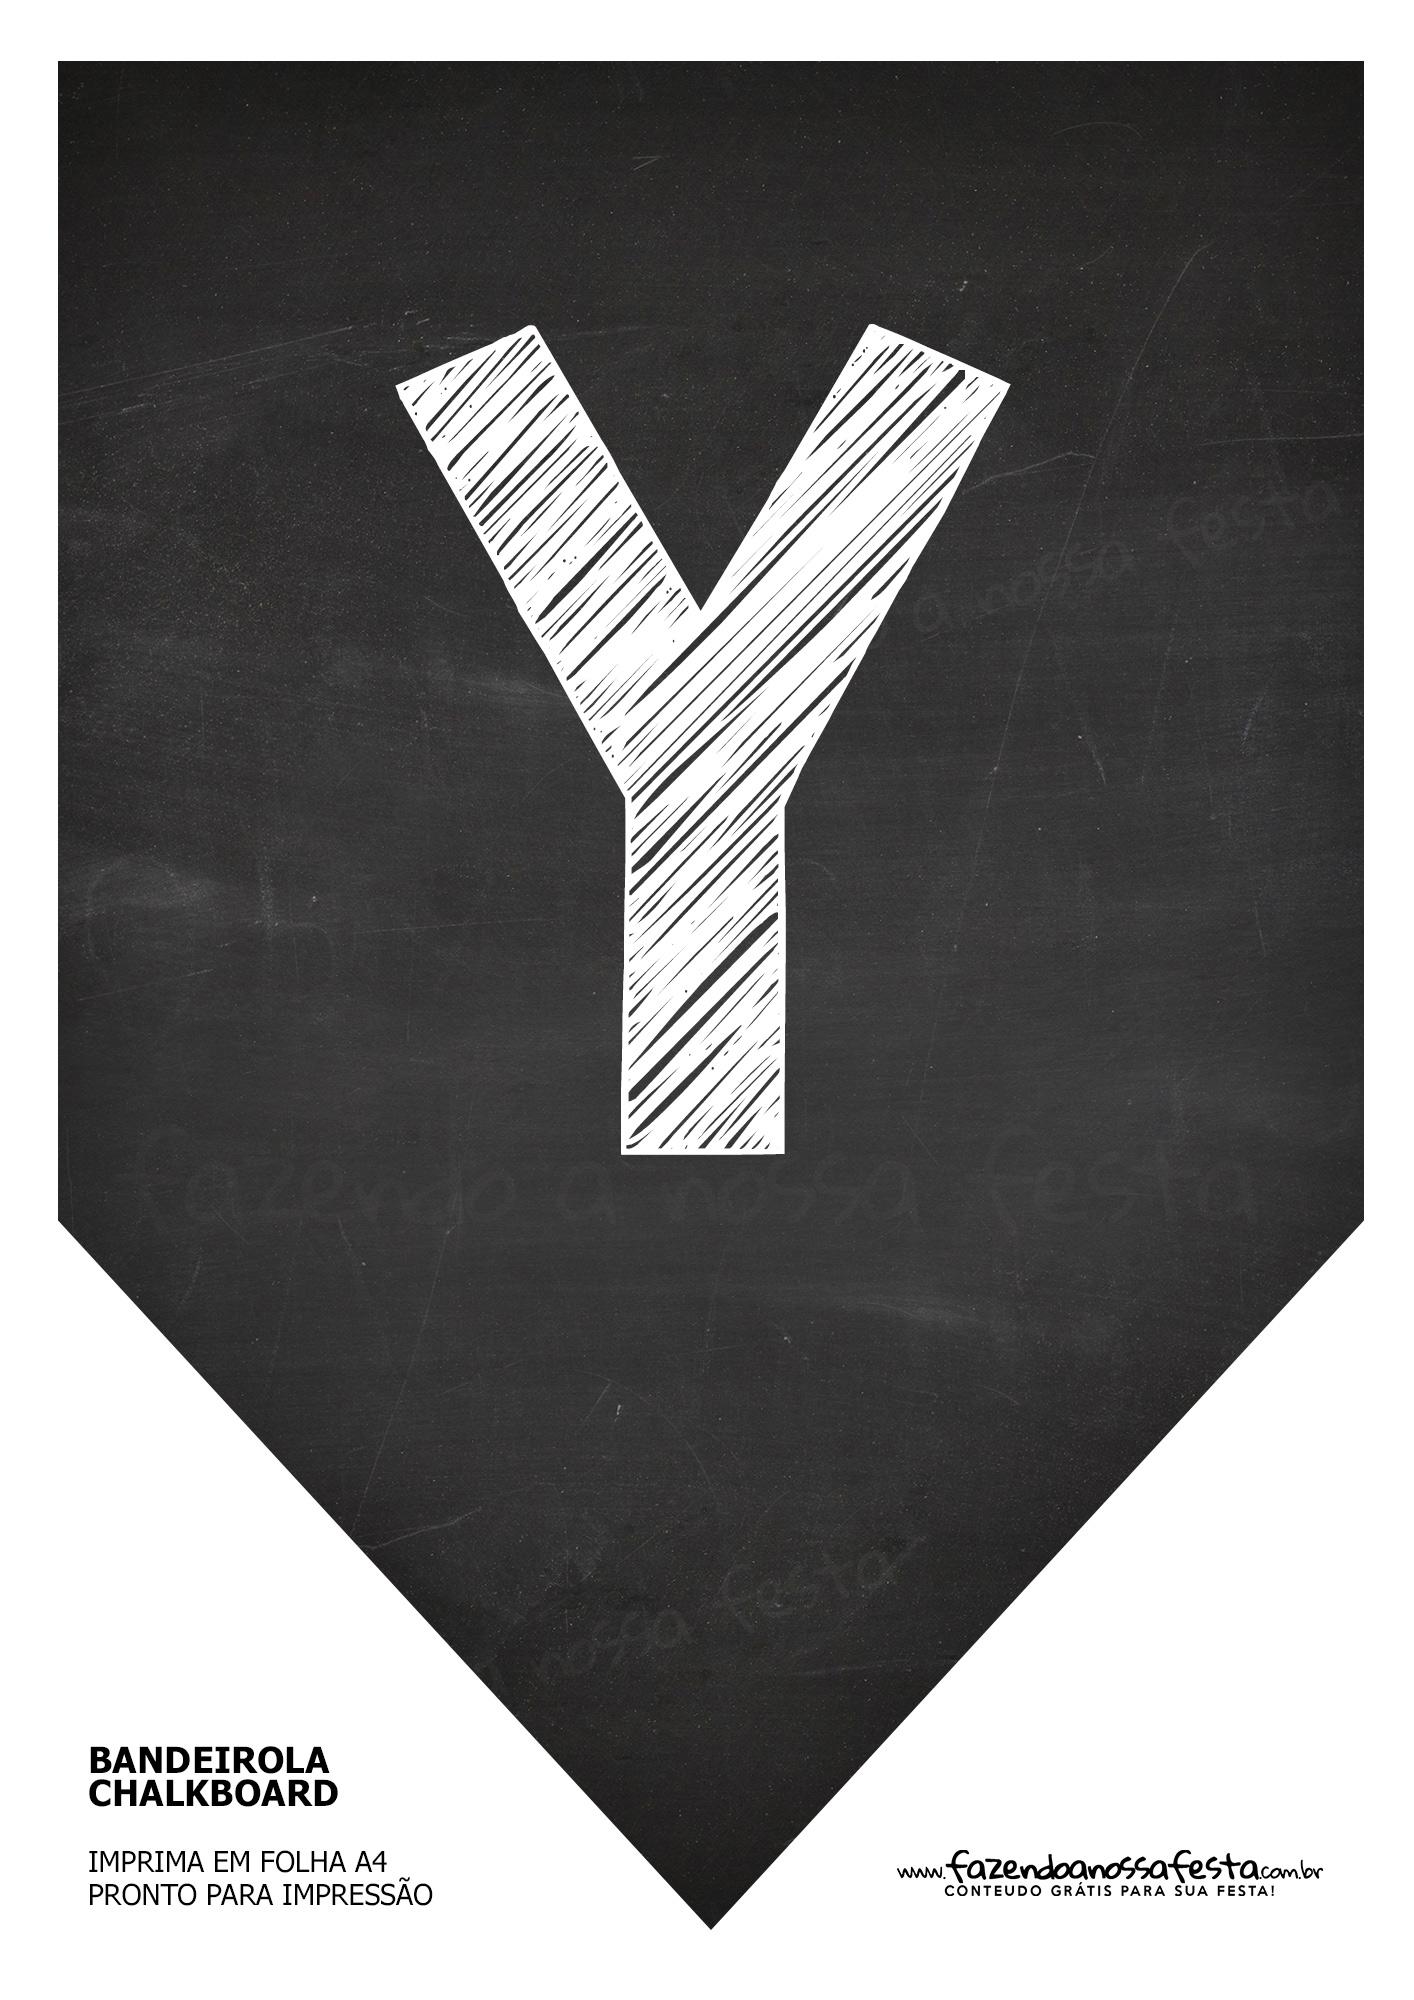 Bandeirinha Chalkboard Y